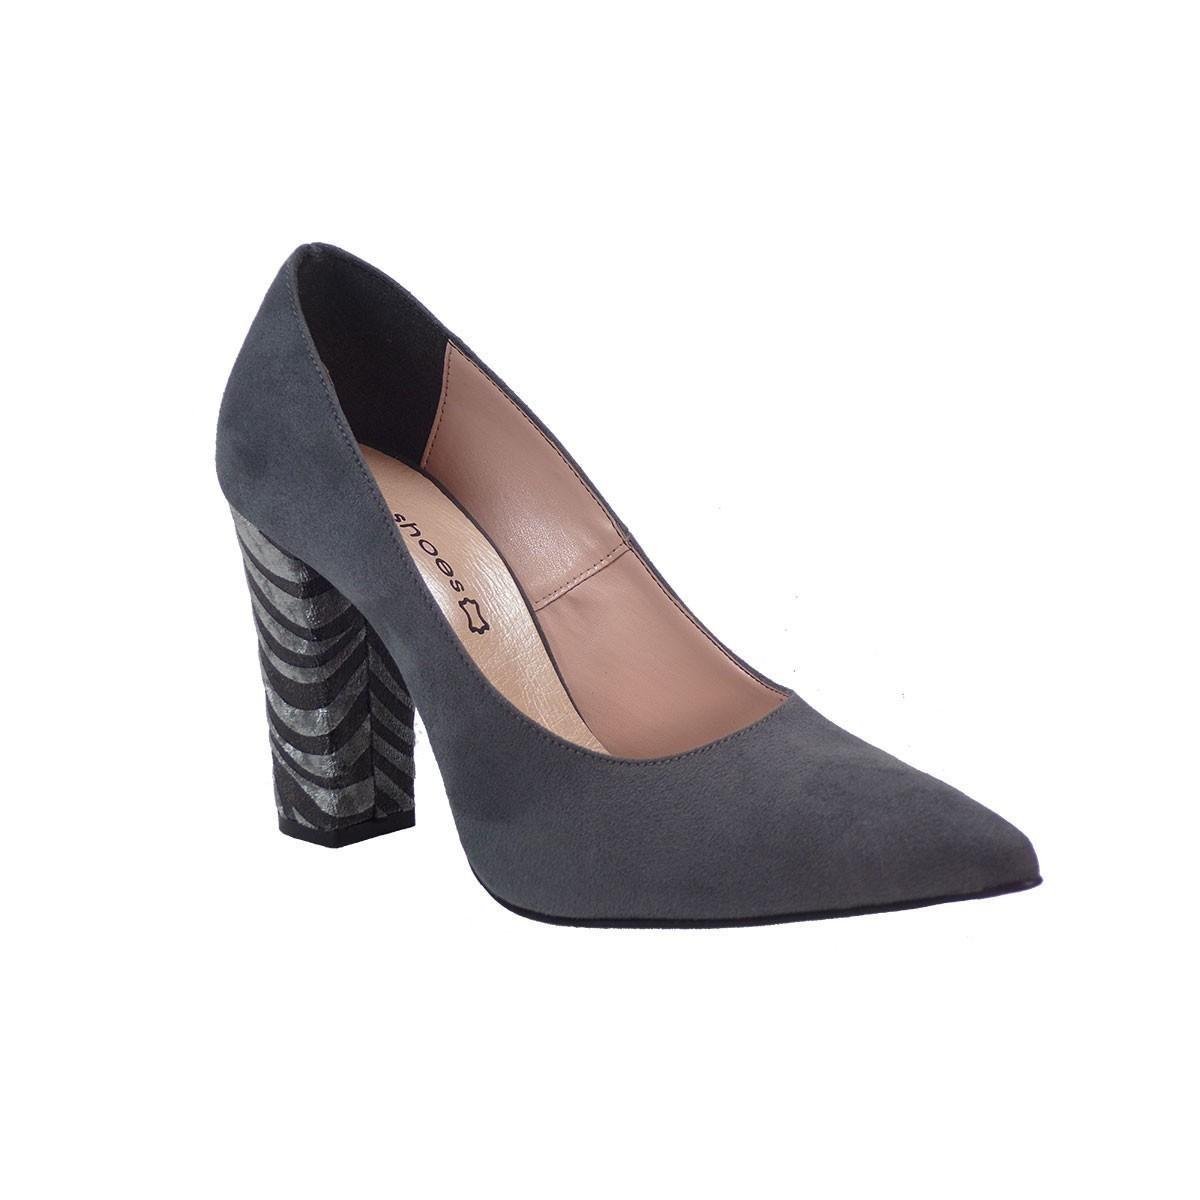 KATIA SHOES Γυναικεία Παπούτσια Γόβες Κ/ΓΟΒΑ/4972 Ανθρακί Καστόρι